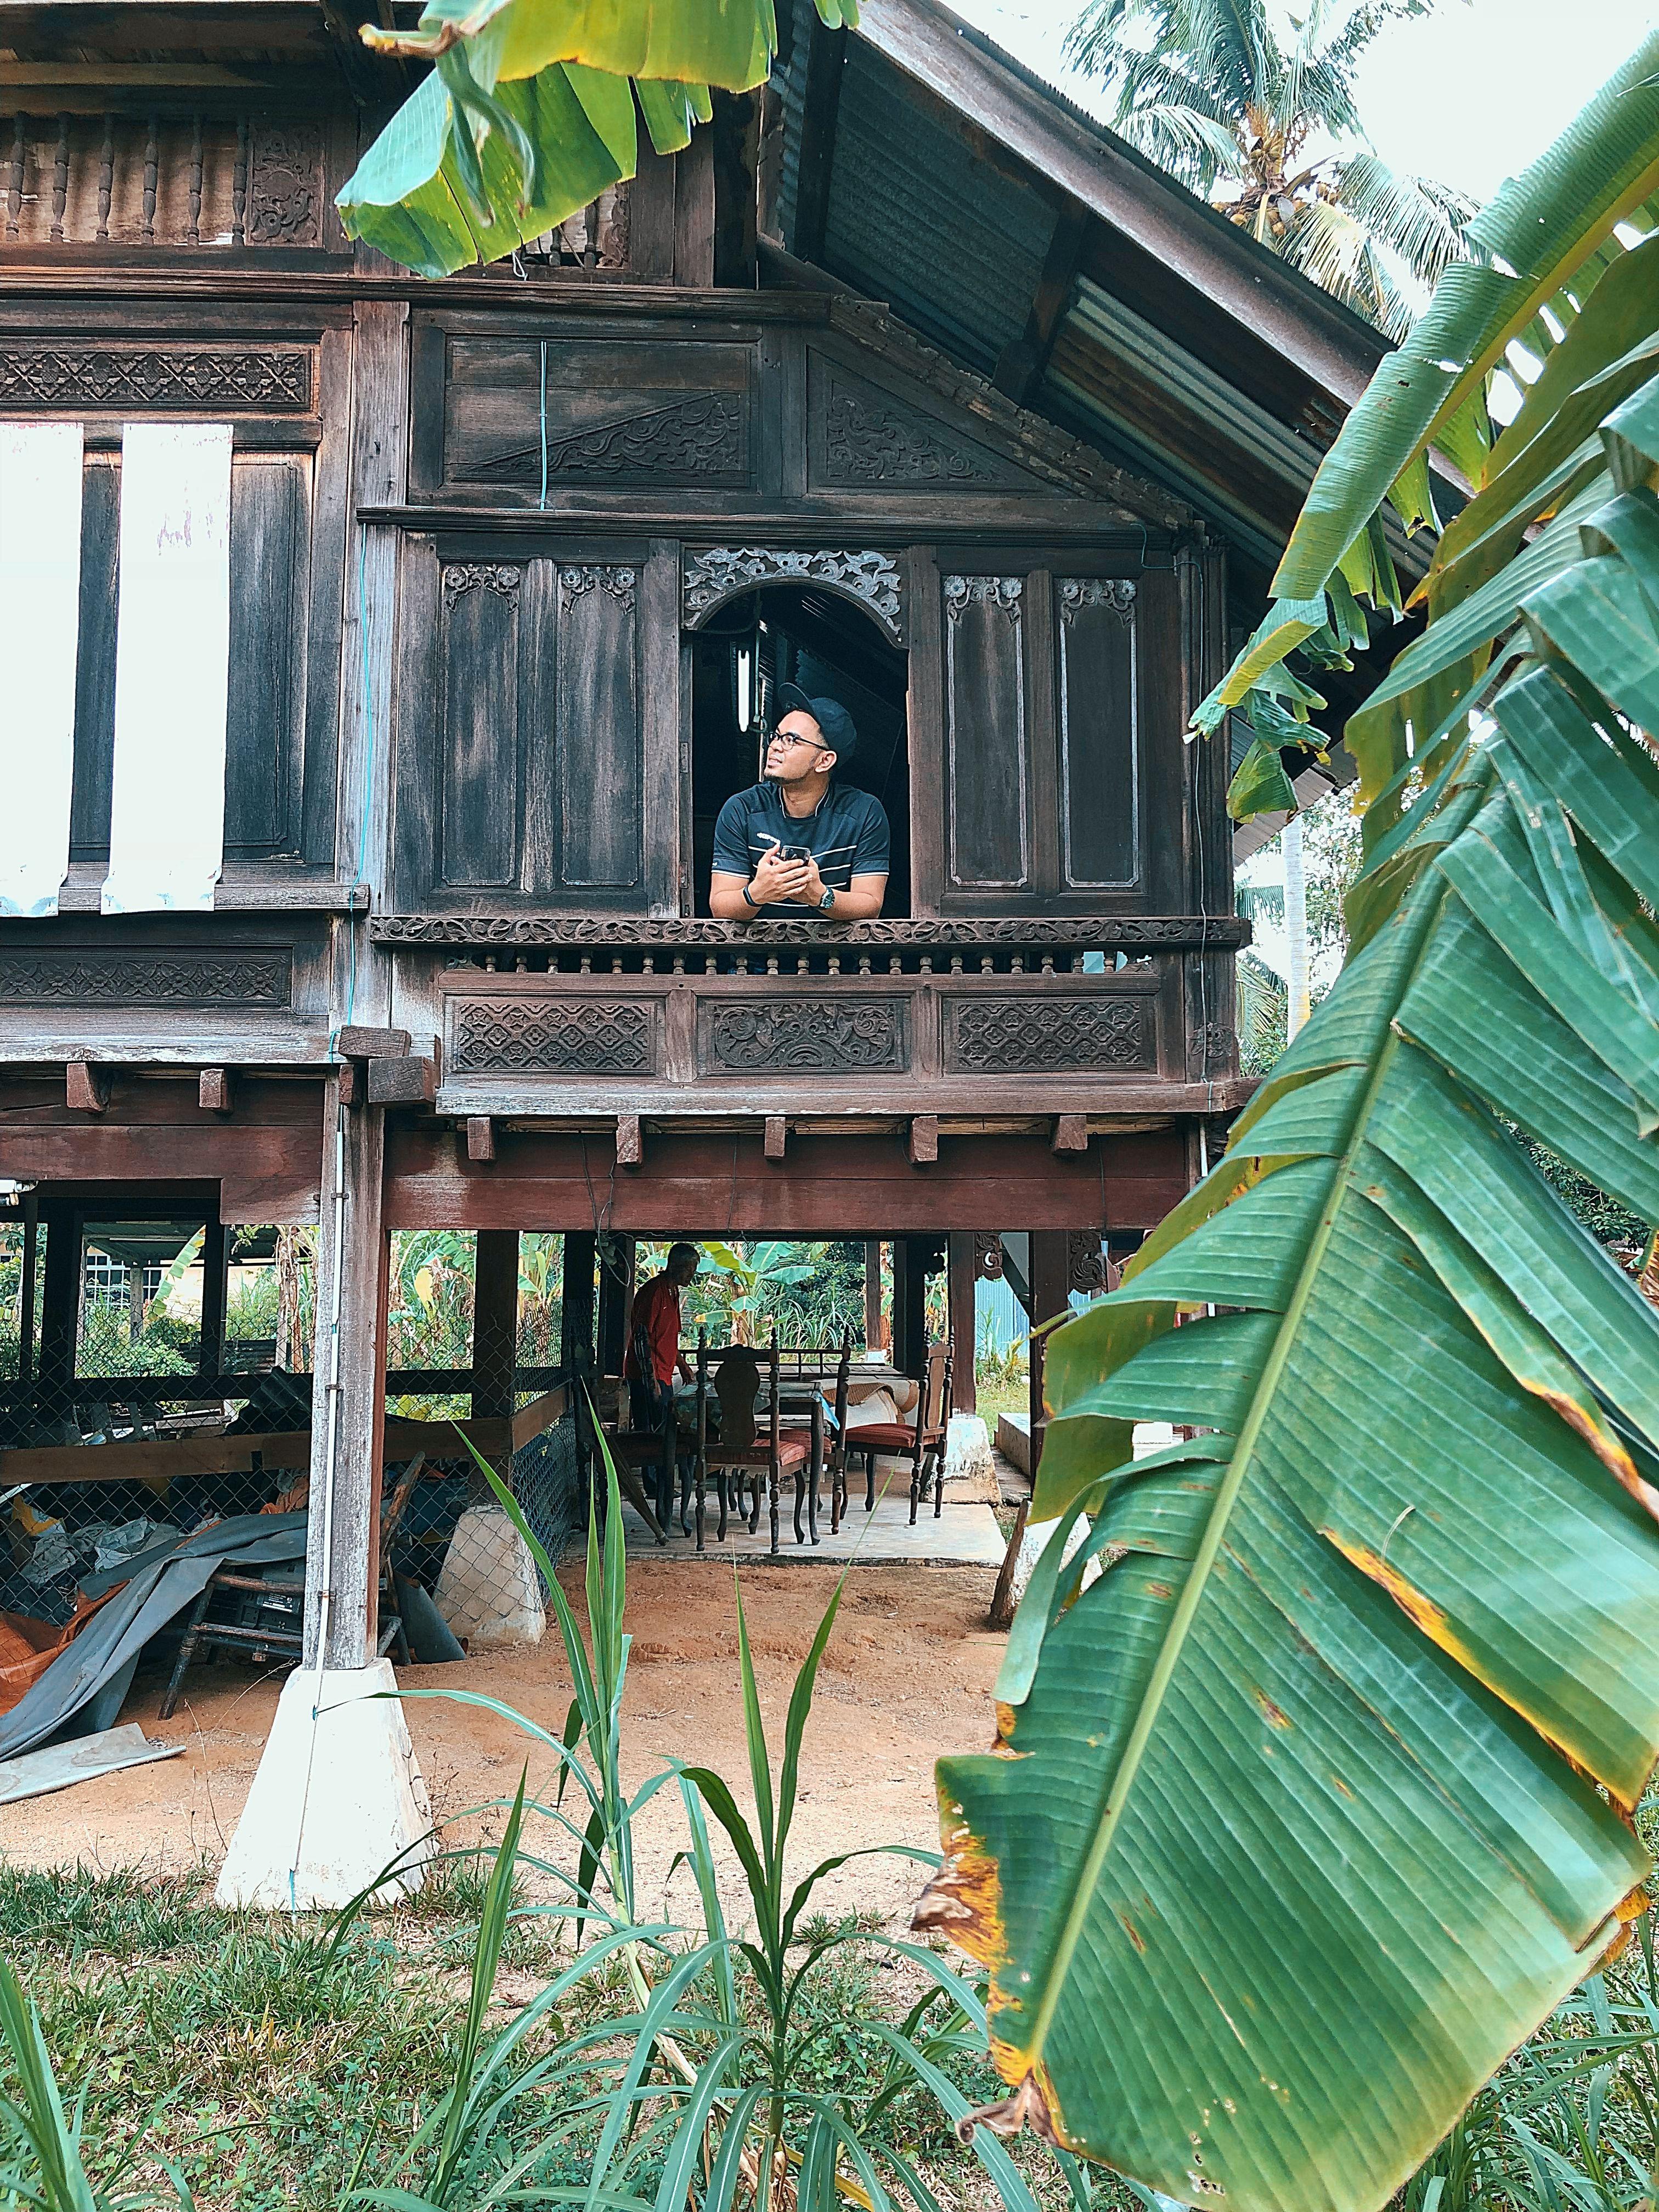 Pin by roy terachi on RUMAH KAMPUNG MELAYU House styles